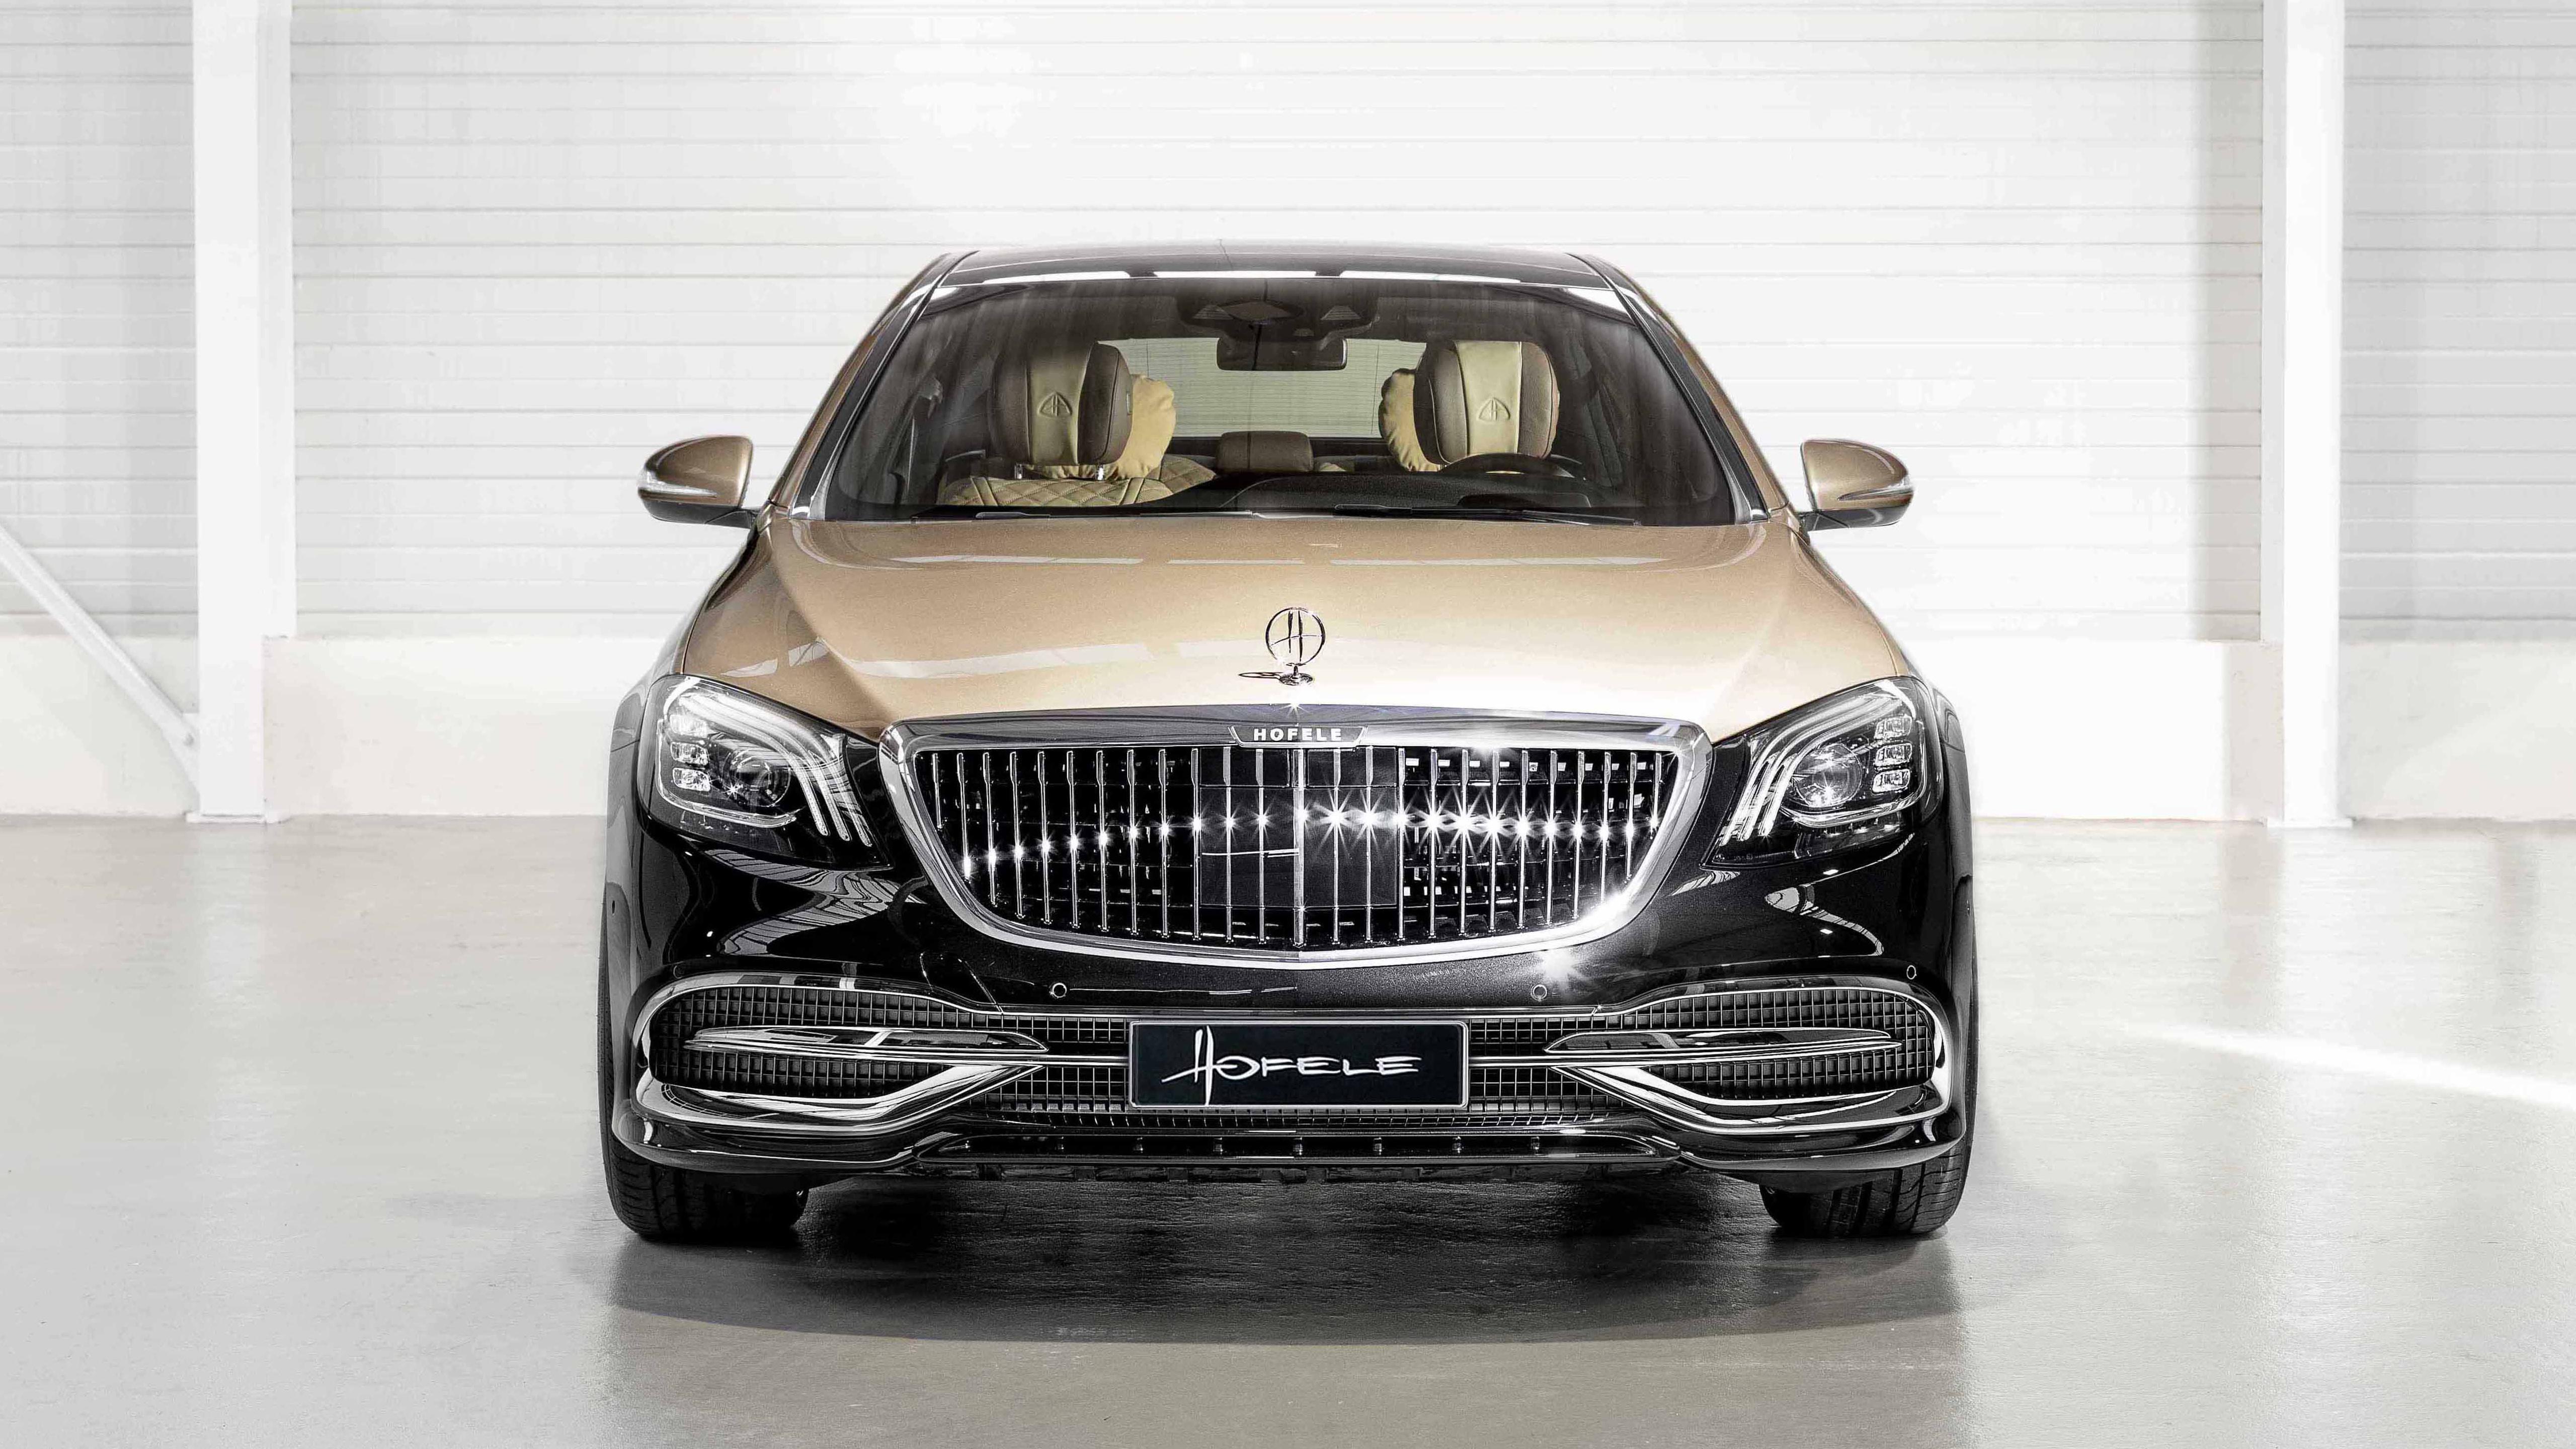 Hofele Design Mercedes Maybach S 560 2019 5k Wallpaper Hd